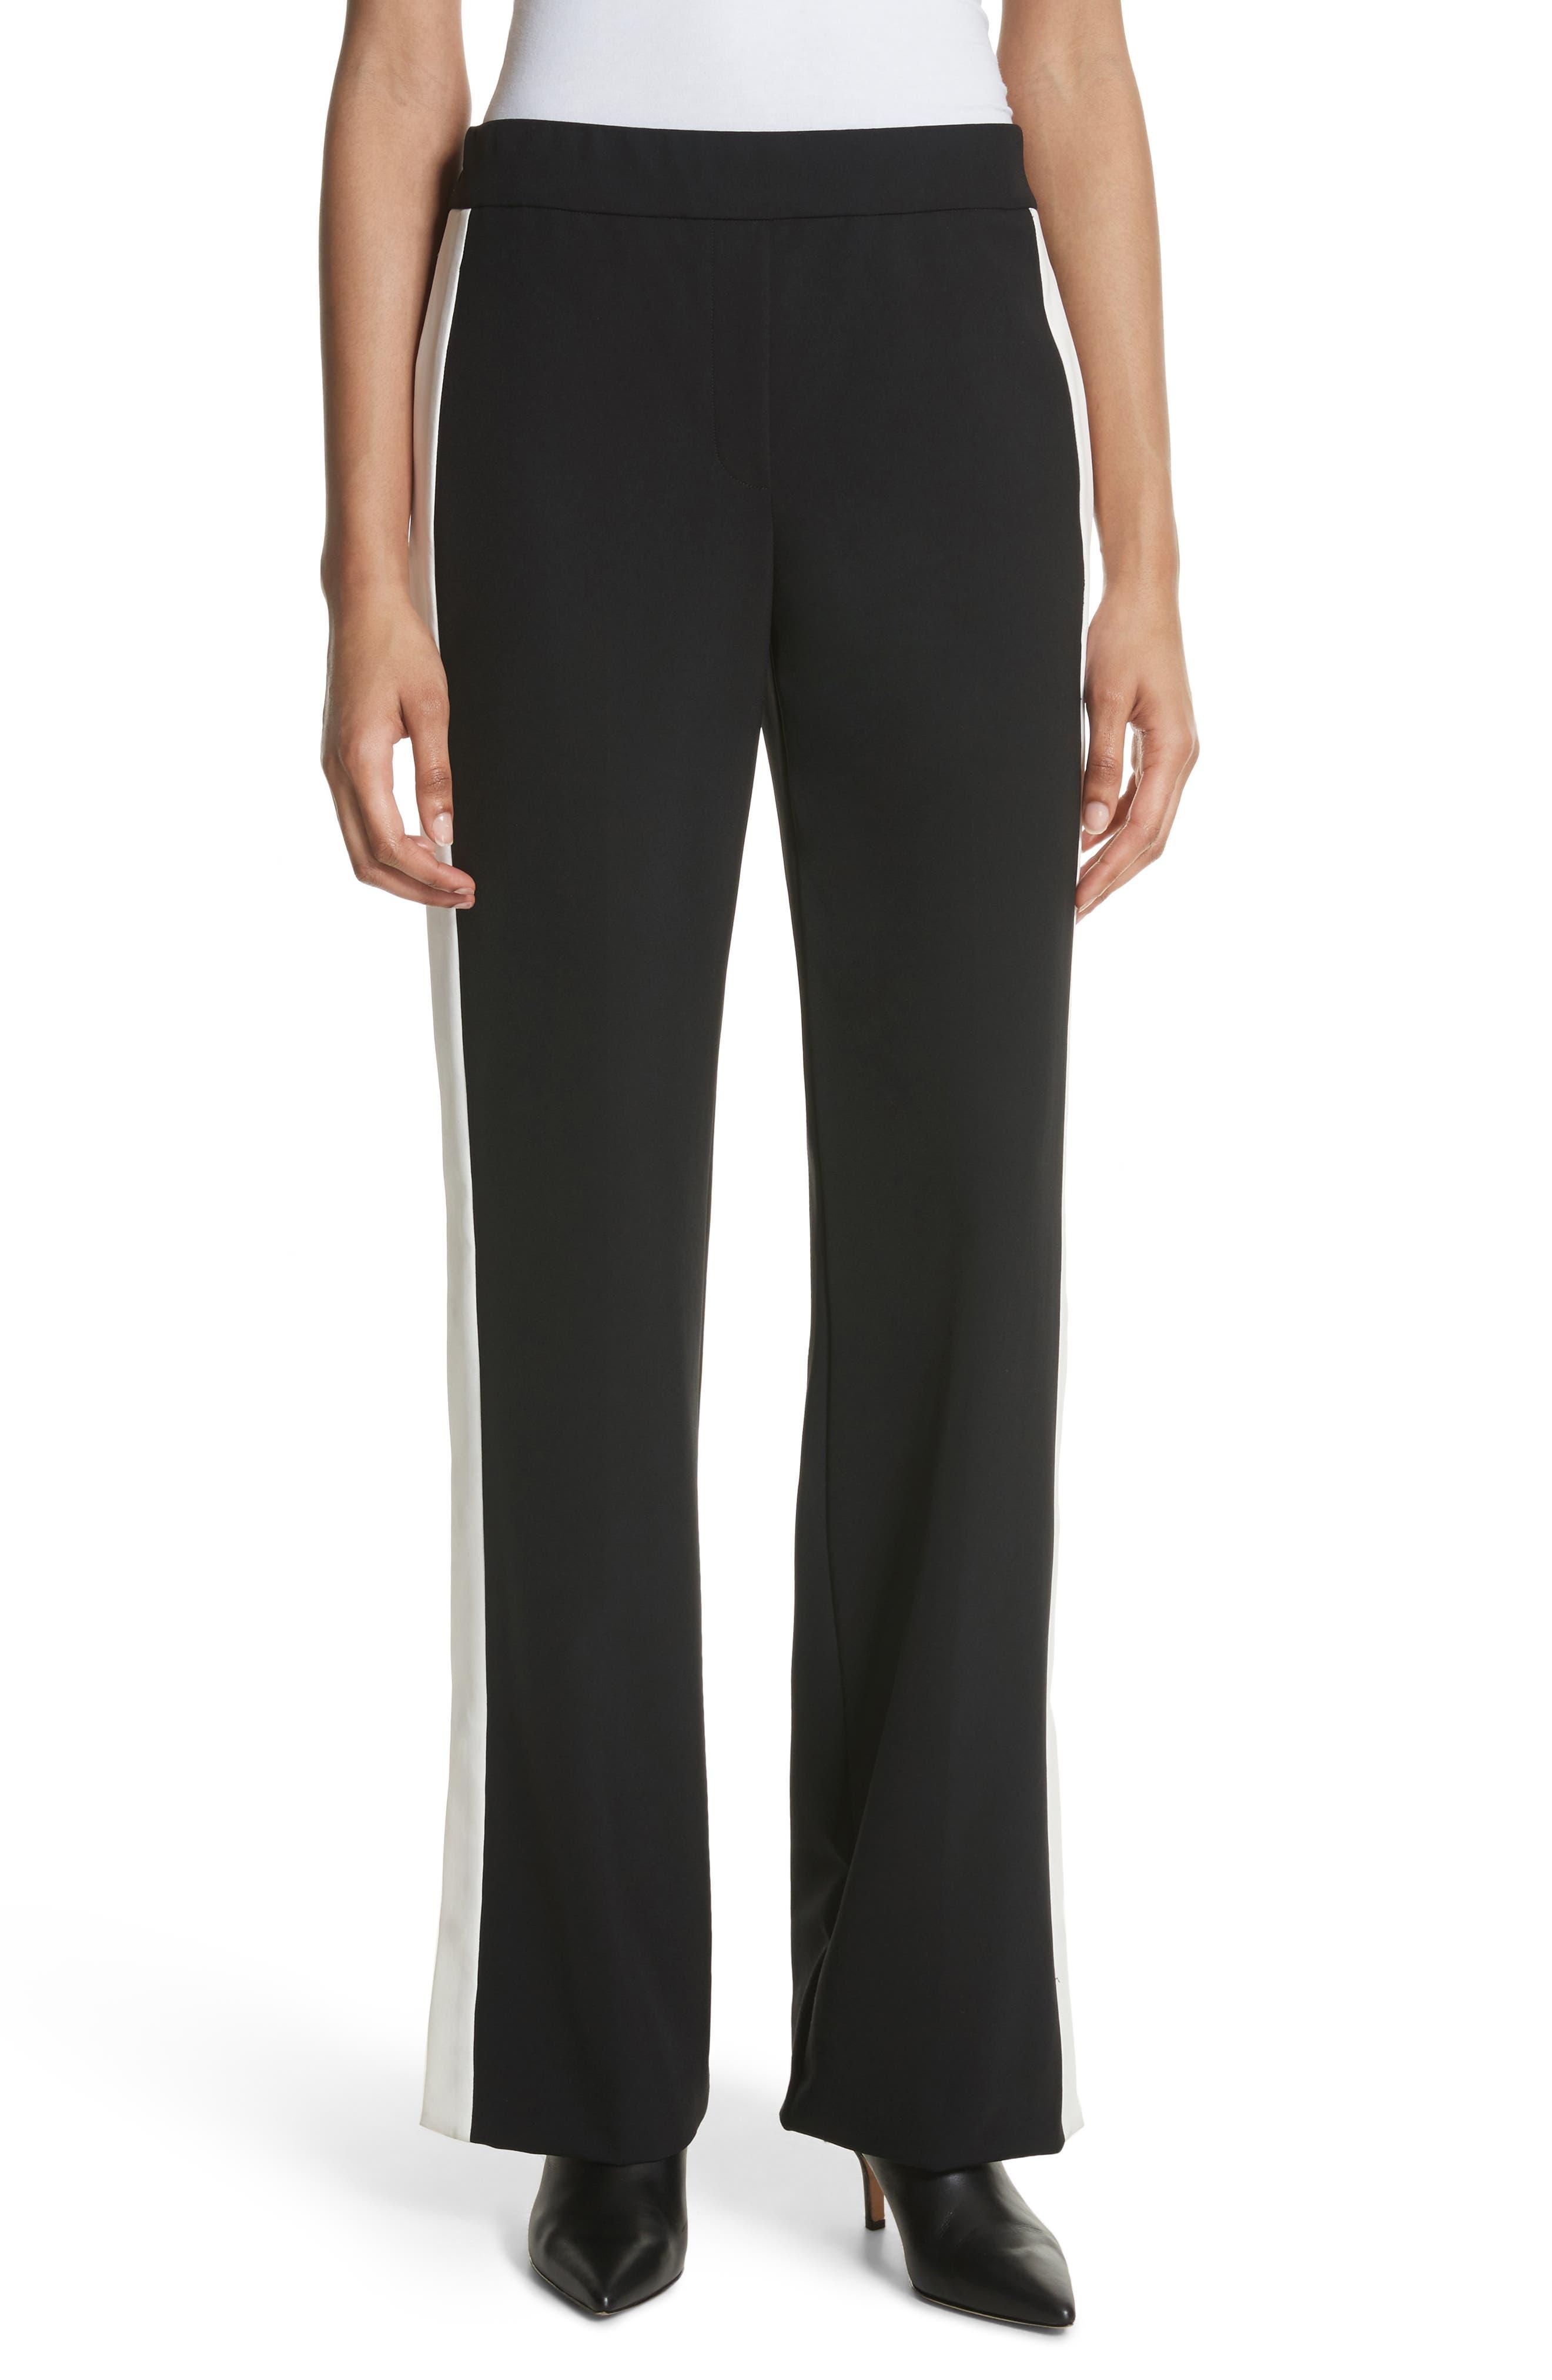 Snap Side Track Pants,                         Main,                         color, Black/ Ivory